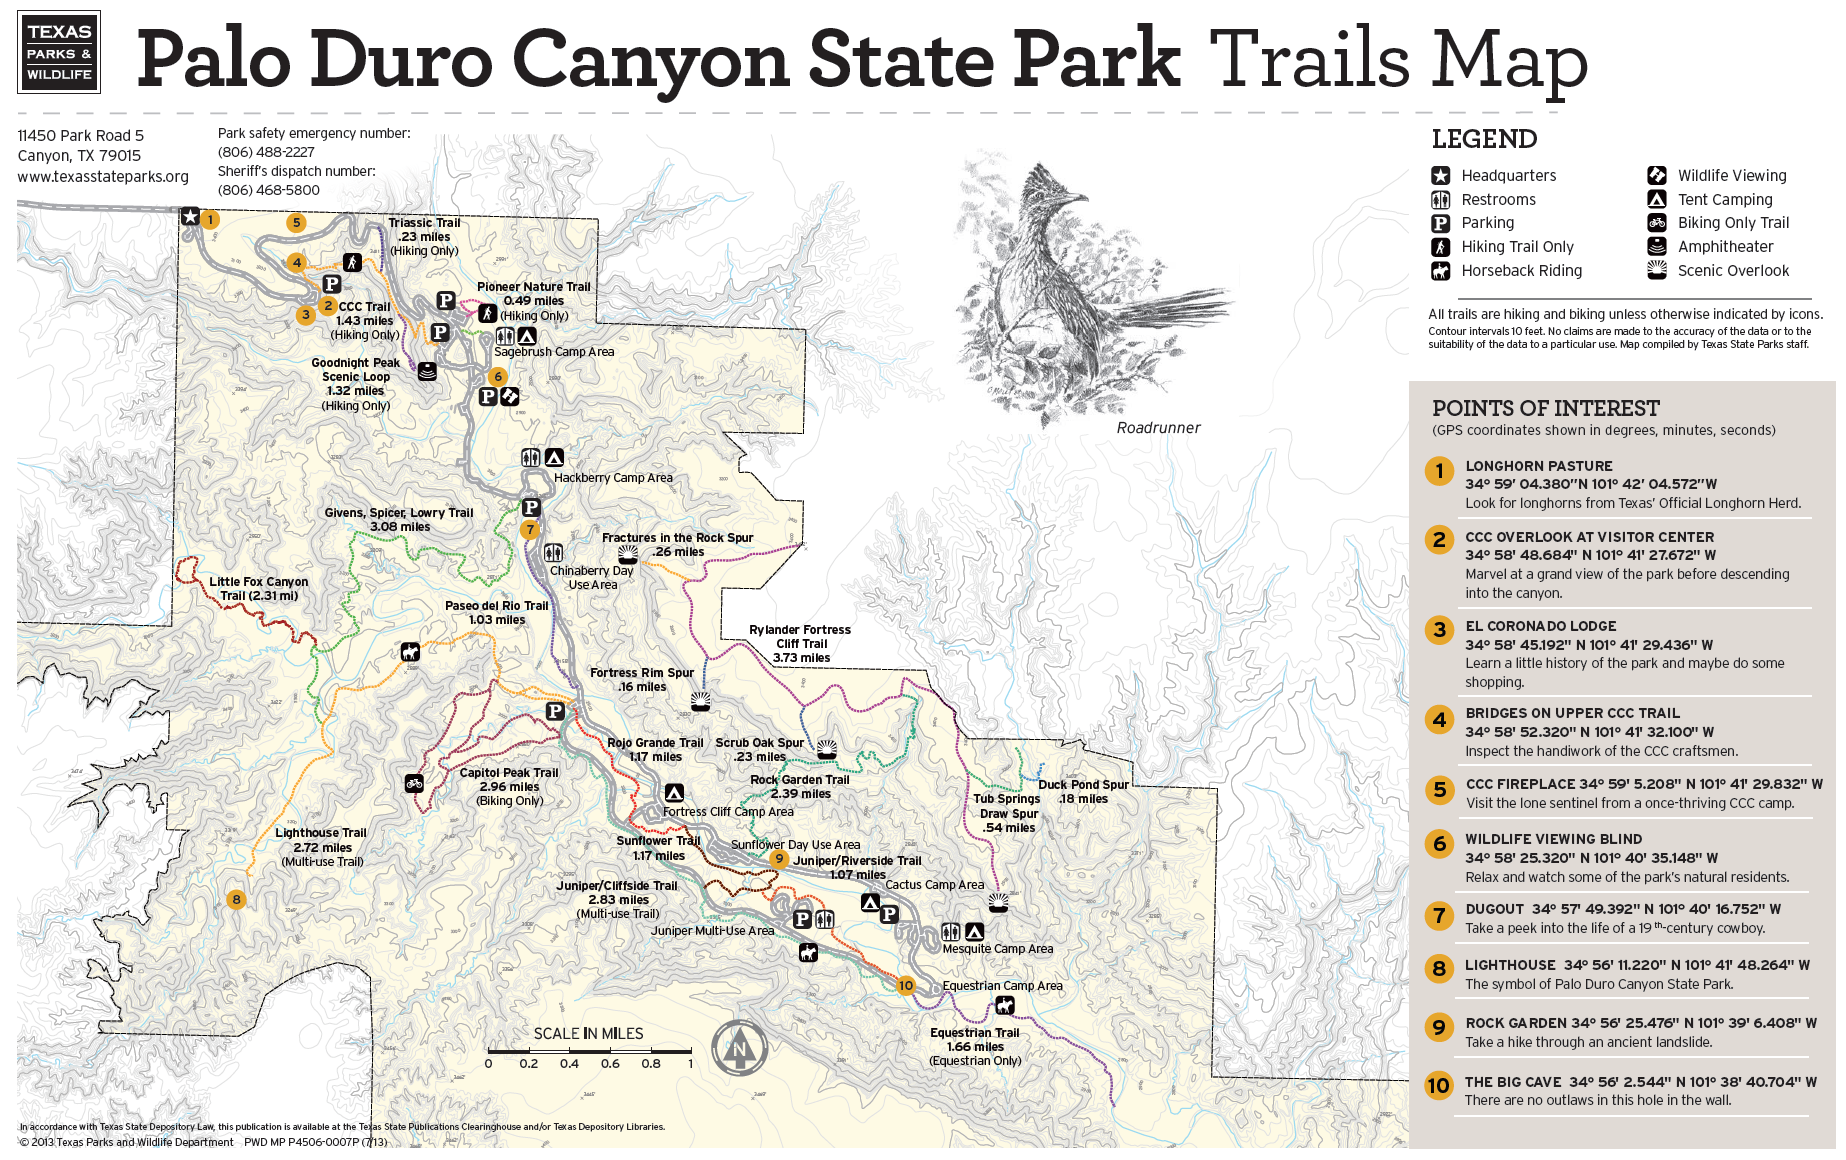 Palo Duro Canyon, Canyon TX Canyon Tx Map on san antonio map, guymon tx map, canyon texas, temple tx map, stillwater tx map, idabel tx map, el paso tx map, sattler tx map, ada tx map, edinburg tx map, cactus tx map, canyon zion national park, big bend national park tx map, rockwall tx map, lafayette tx map, lubbock tx map, randall county tx map, buffalo springs tx map, banquete tx map, abilene tx map,